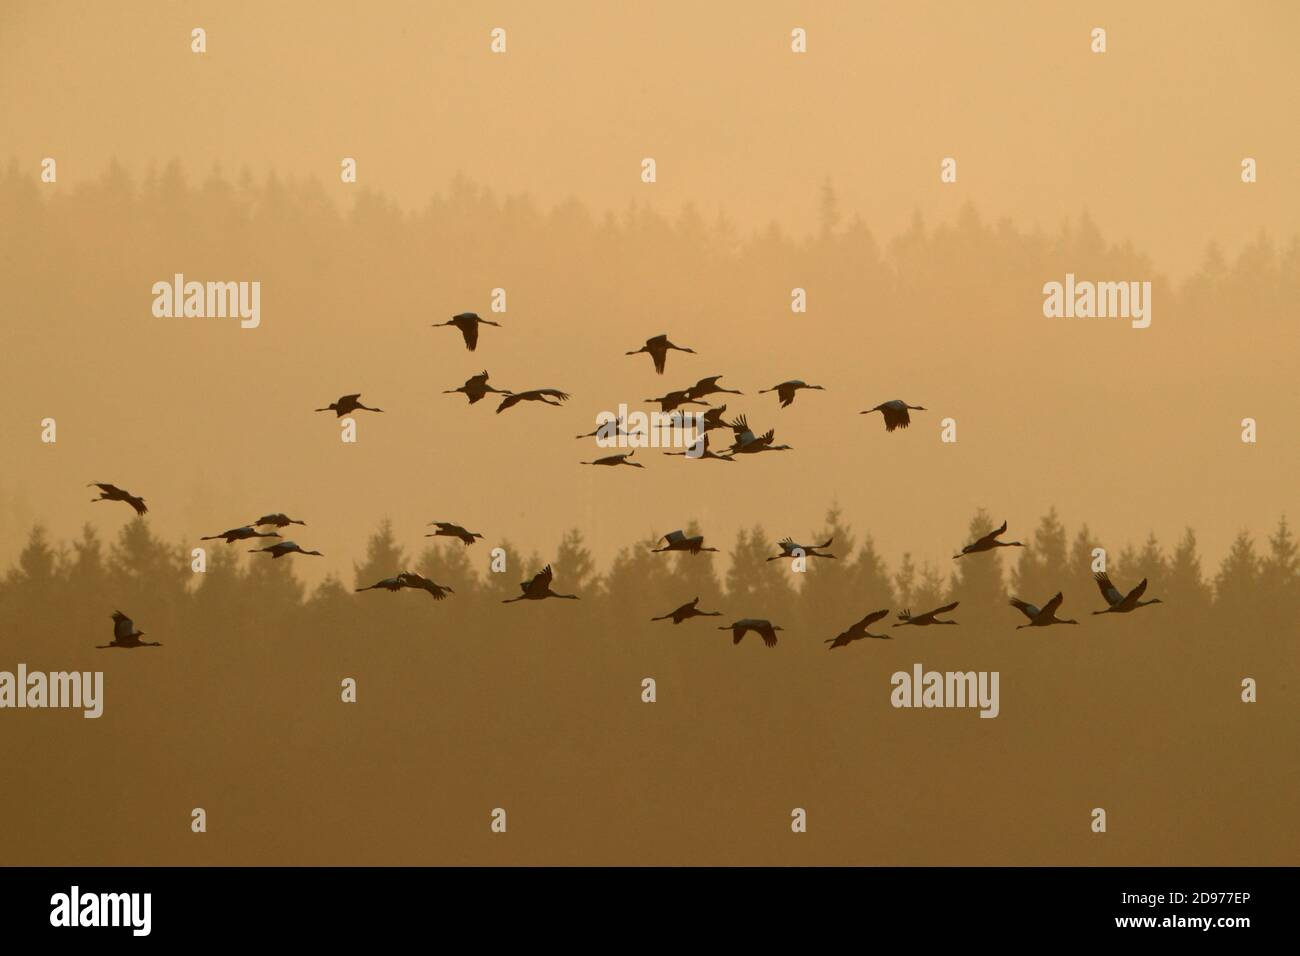 Common Crane (Grus grus) flying group, Fagne wallonne, Ardennes, Belgium Stock Photo